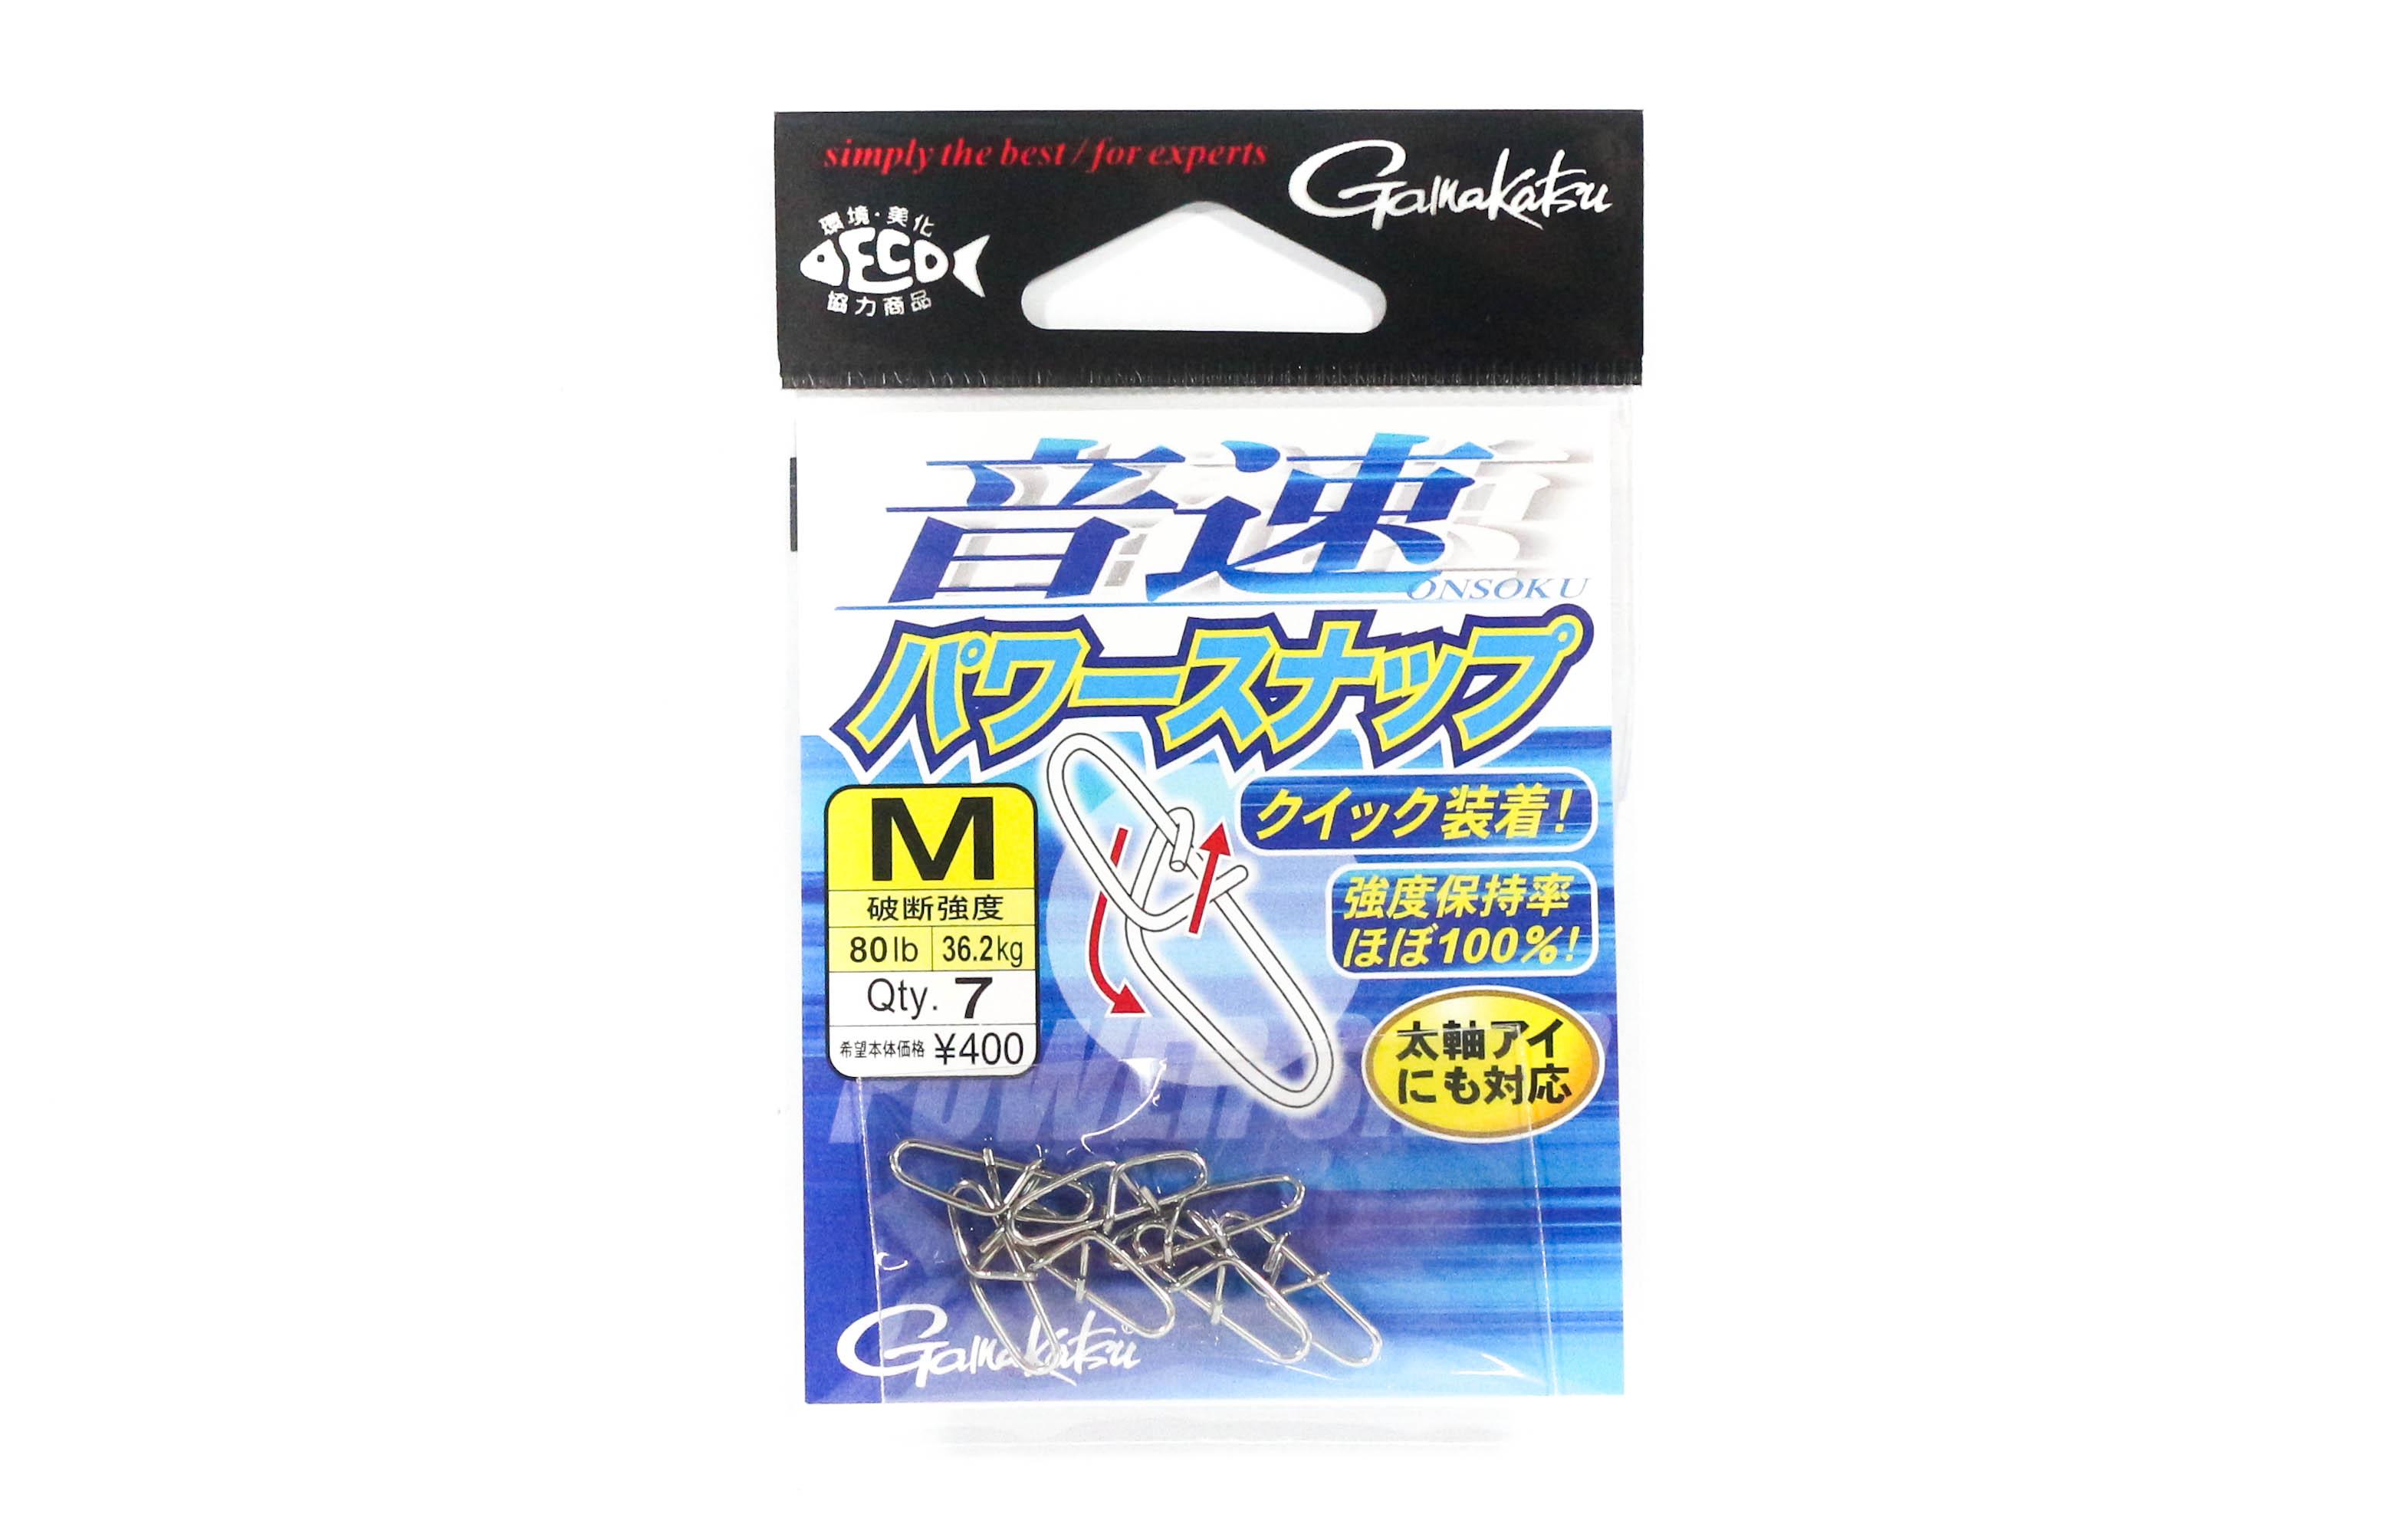 Gamakatsu Onsoku Power Snap Size M 80lb Test (3141)